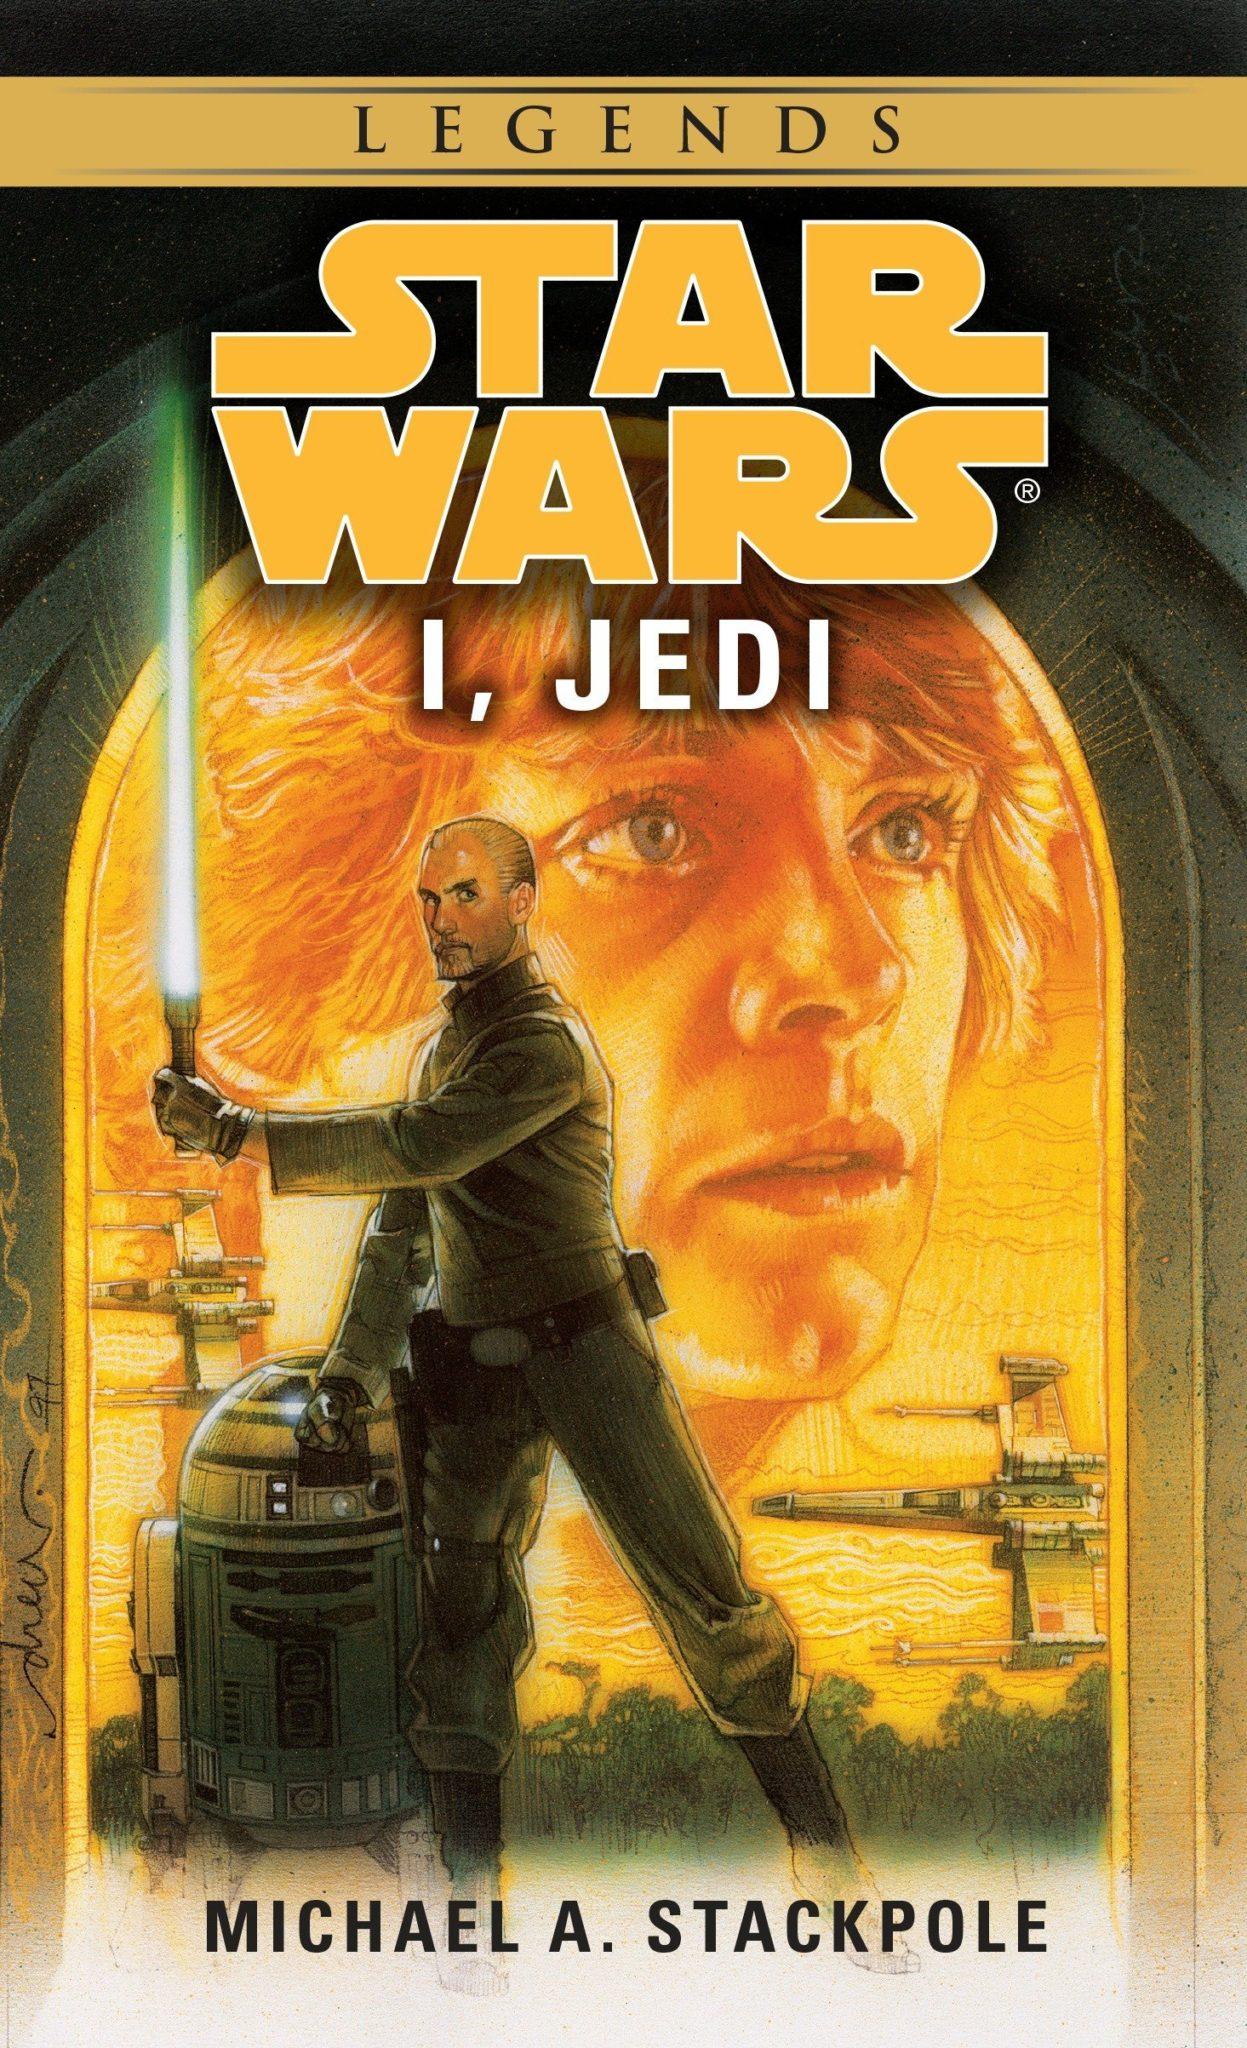 Star Wars books 16